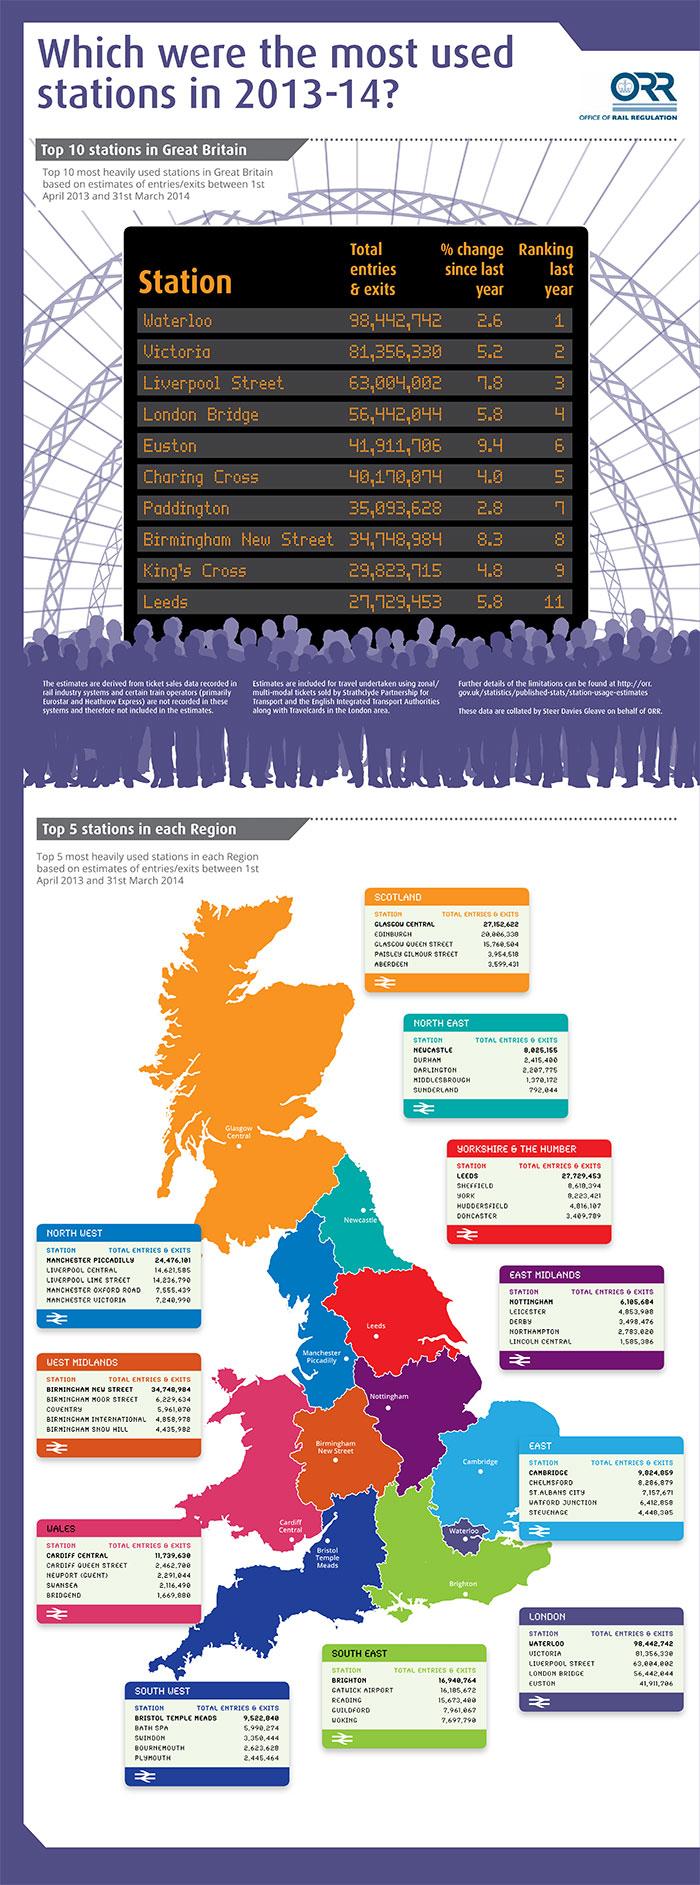 ORR station usage infographic 20141204